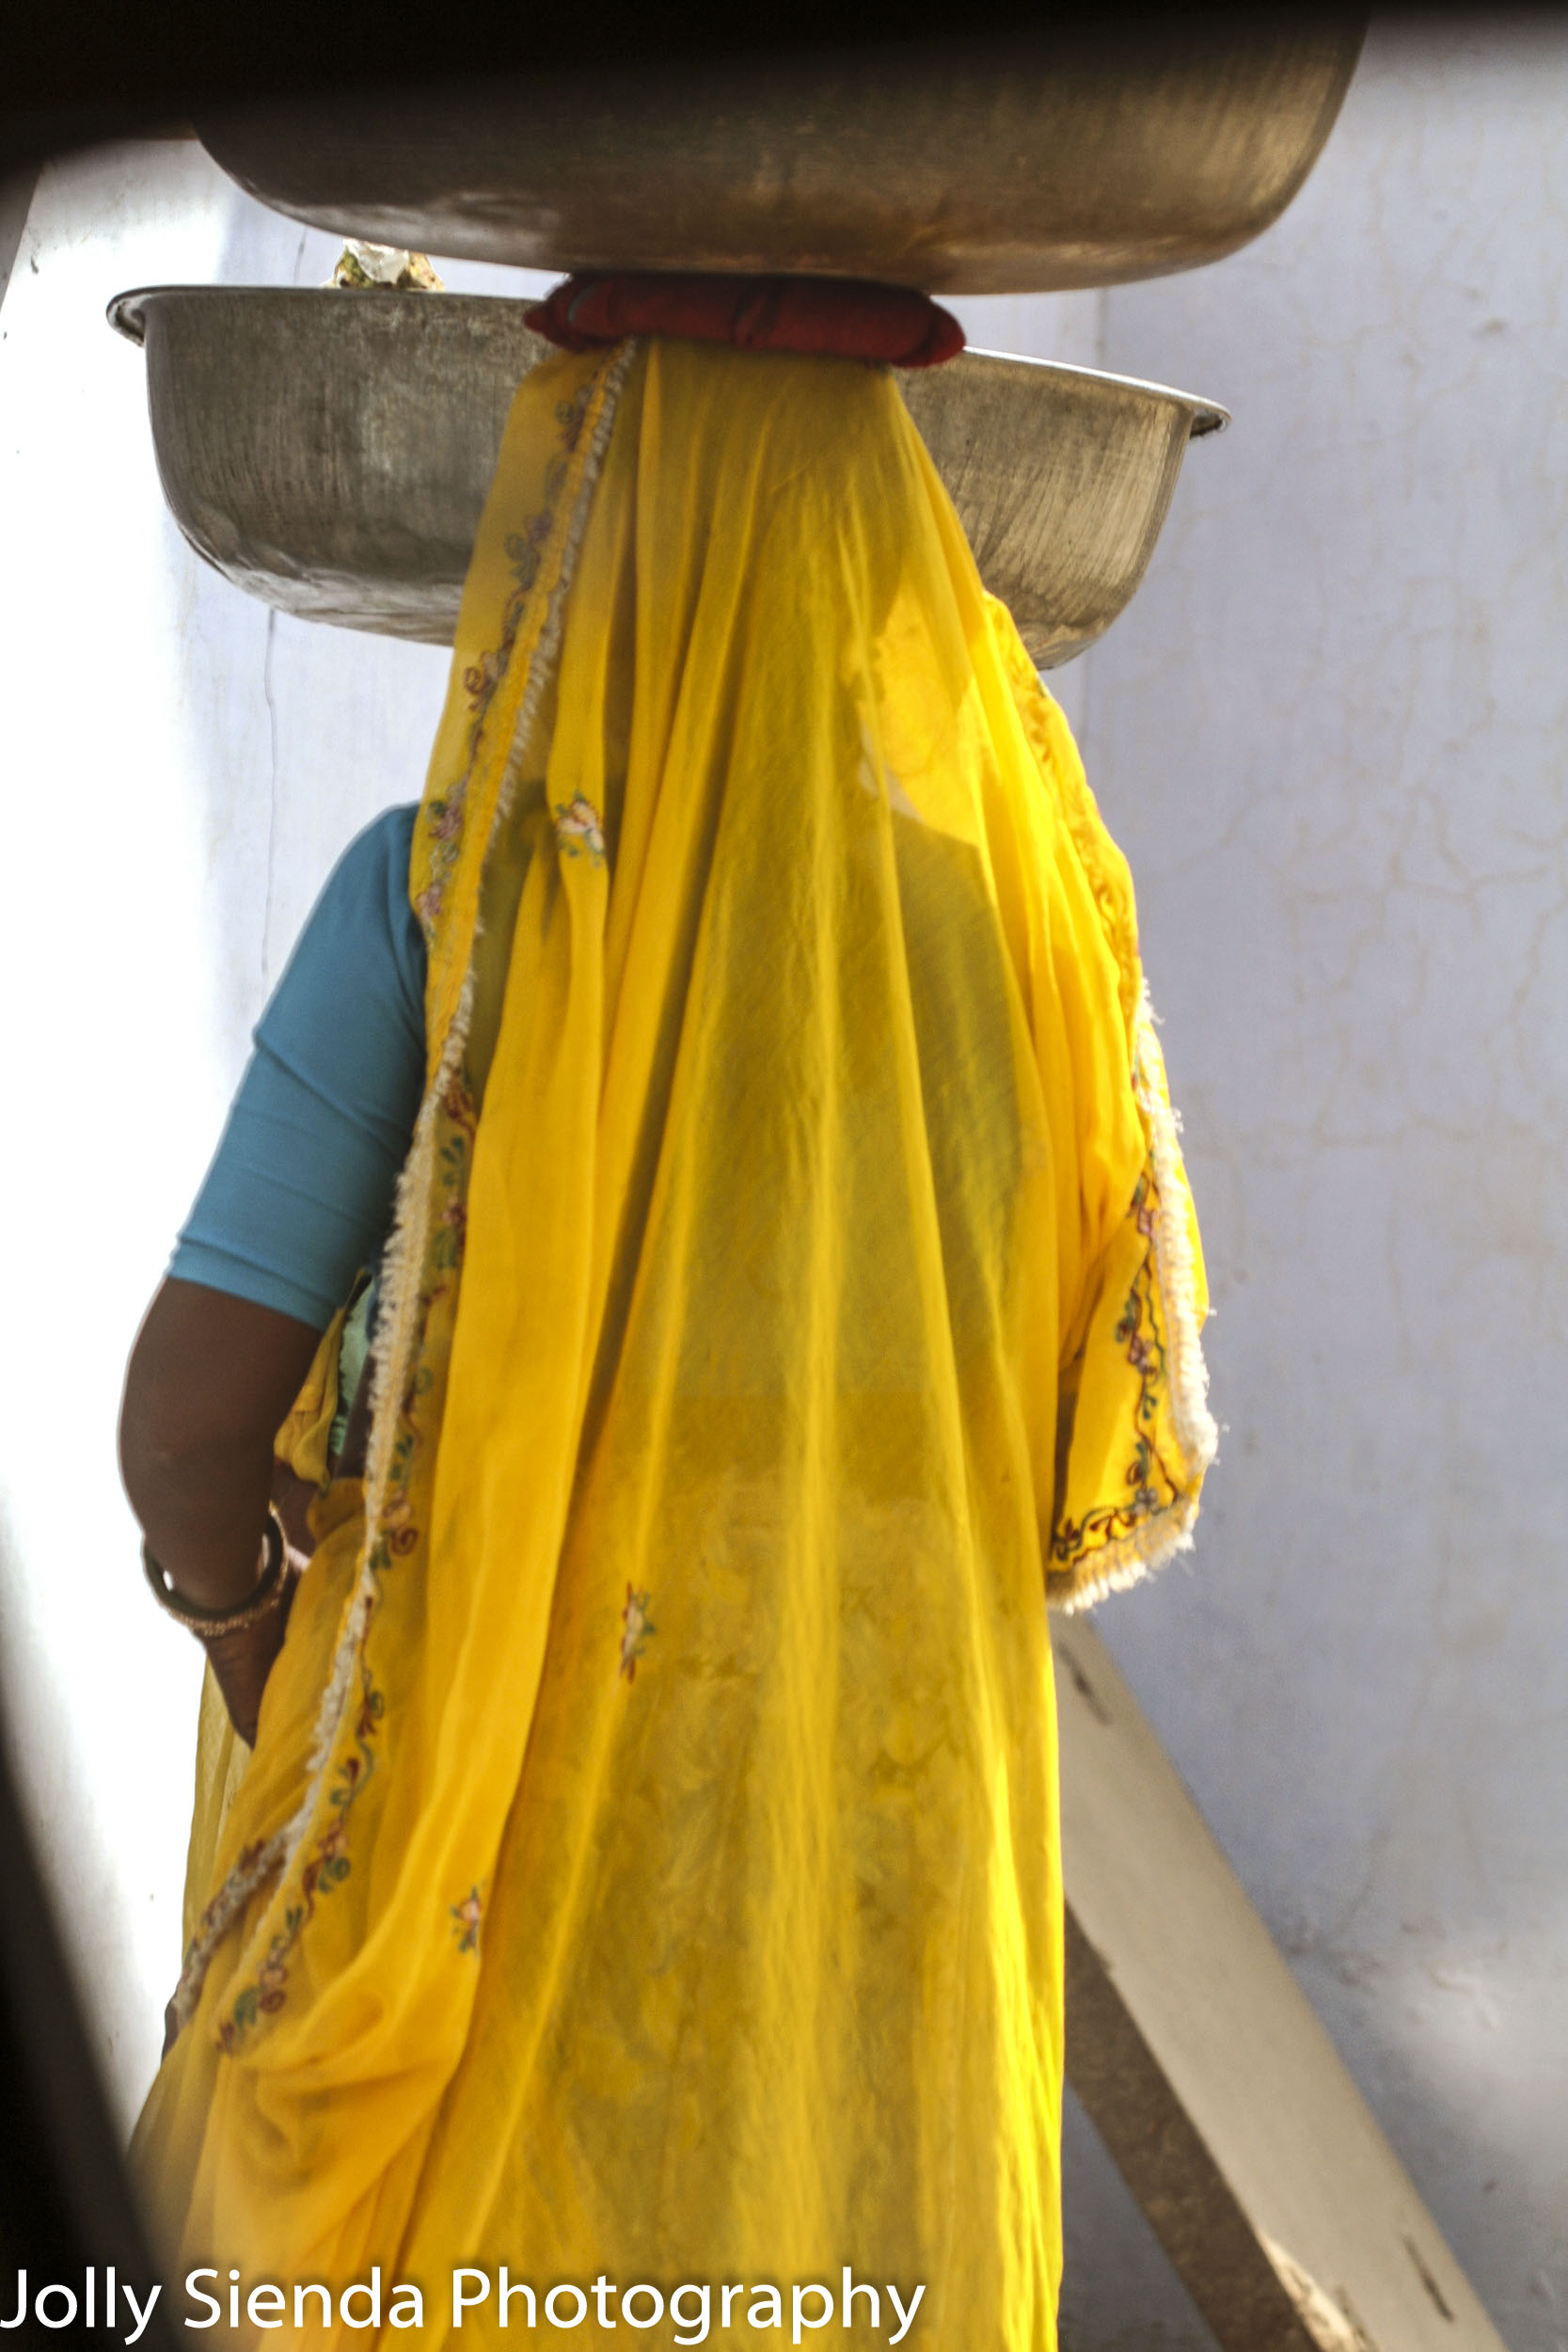 Woman wearing a sari balances copper bowls on her head